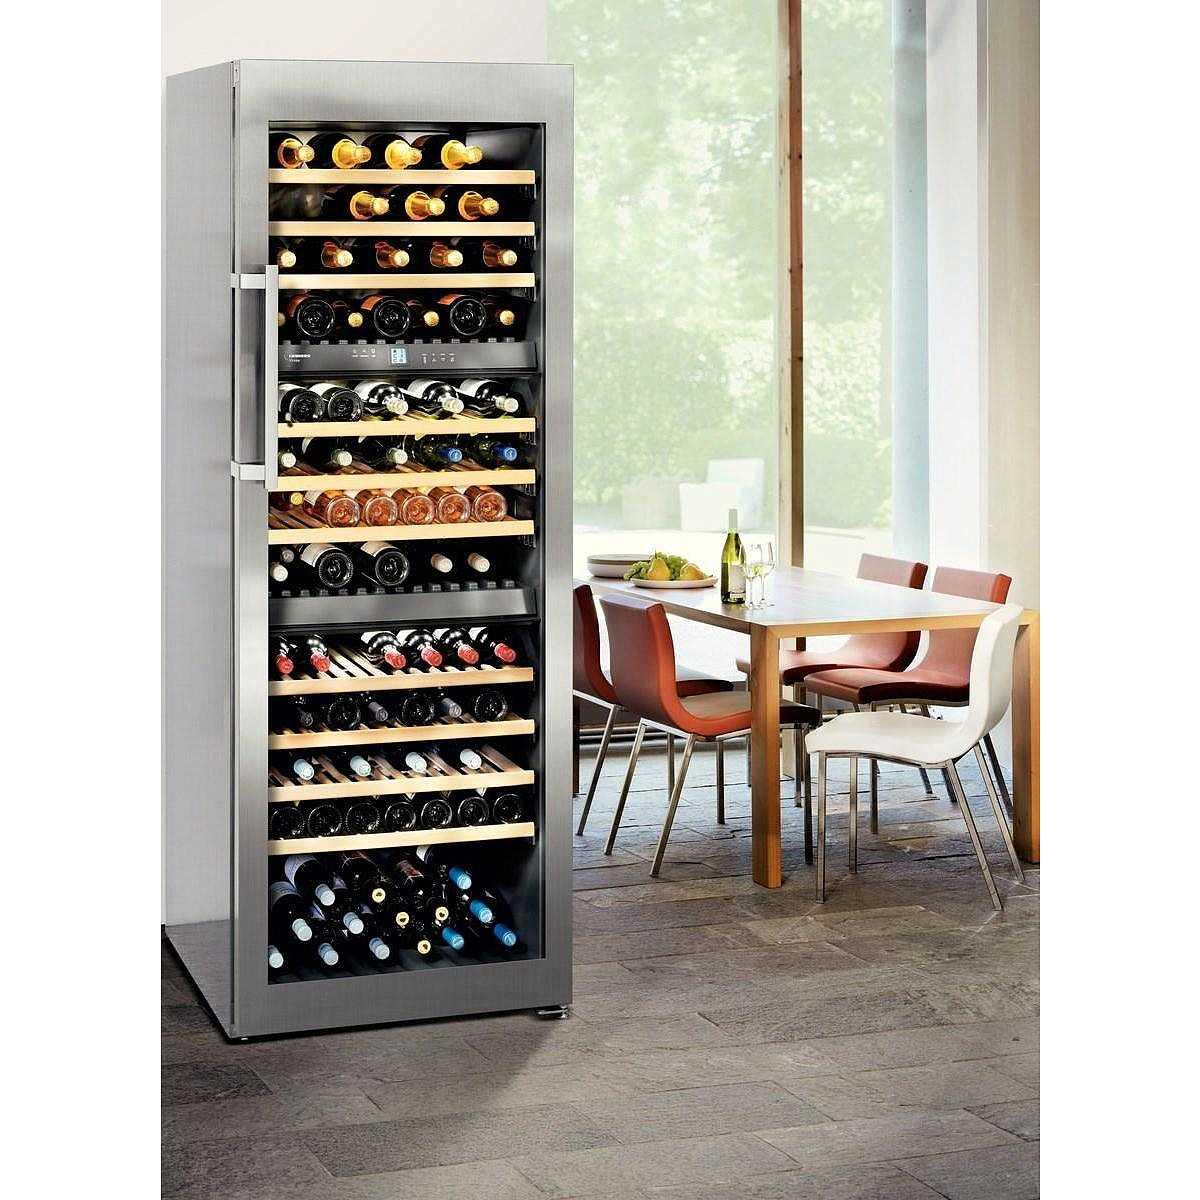 liebherr wtes 5872 vinidor frigo cantina 178 bottiglie powercooling classe a acciaio inox. Black Bedroom Furniture Sets. Home Design Ideas